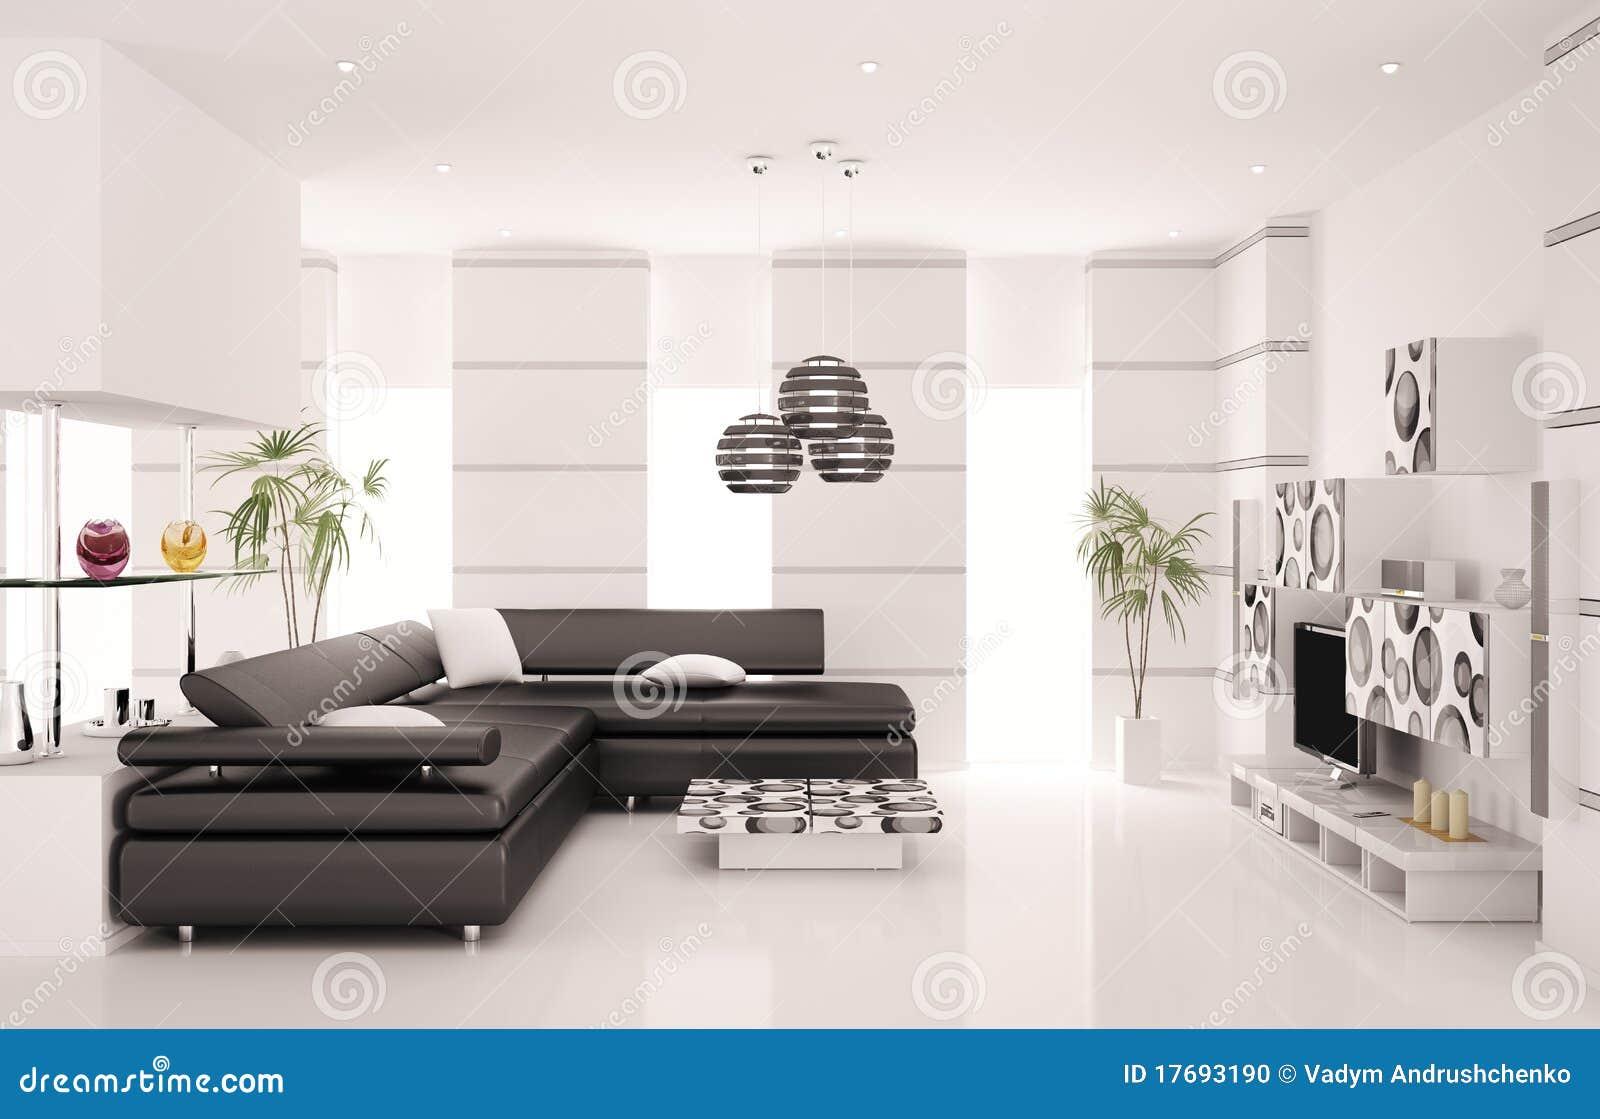 Moderne woonkamer binnenlandse 3d geeft terug stock illustratie afbeelding 17693190 - Foto van moderne woonkamer ...